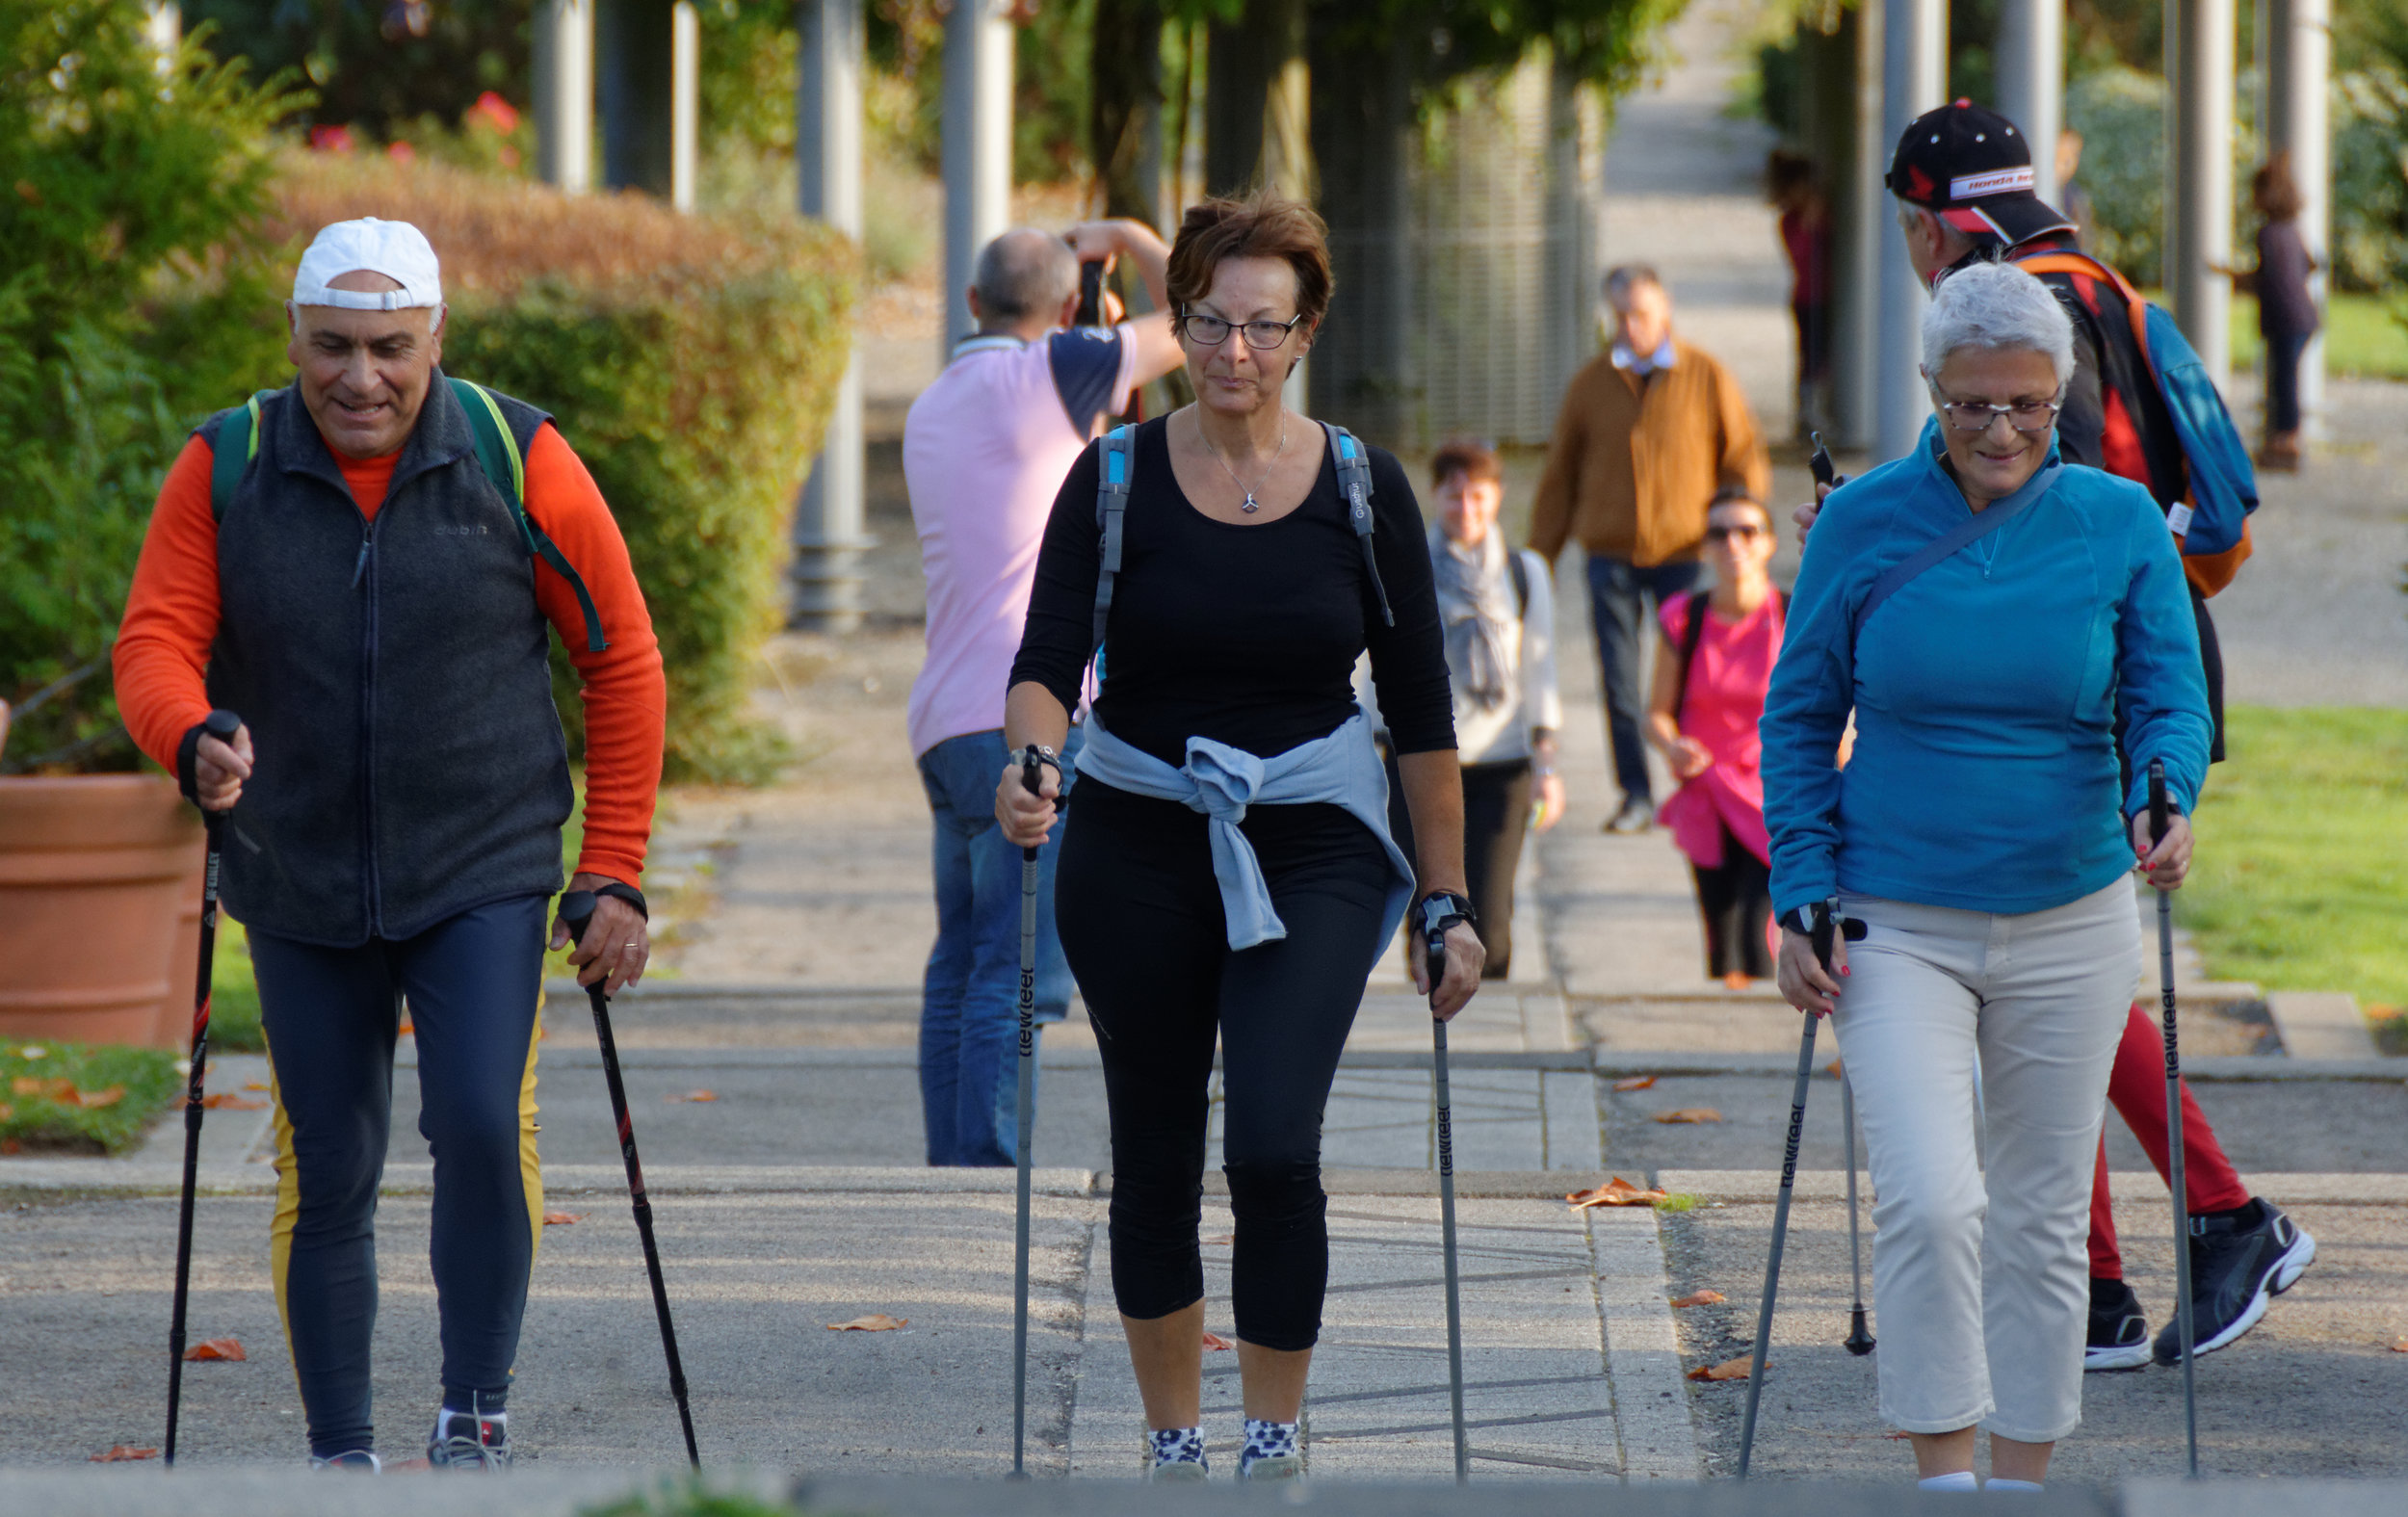 Boomers walking.jpg